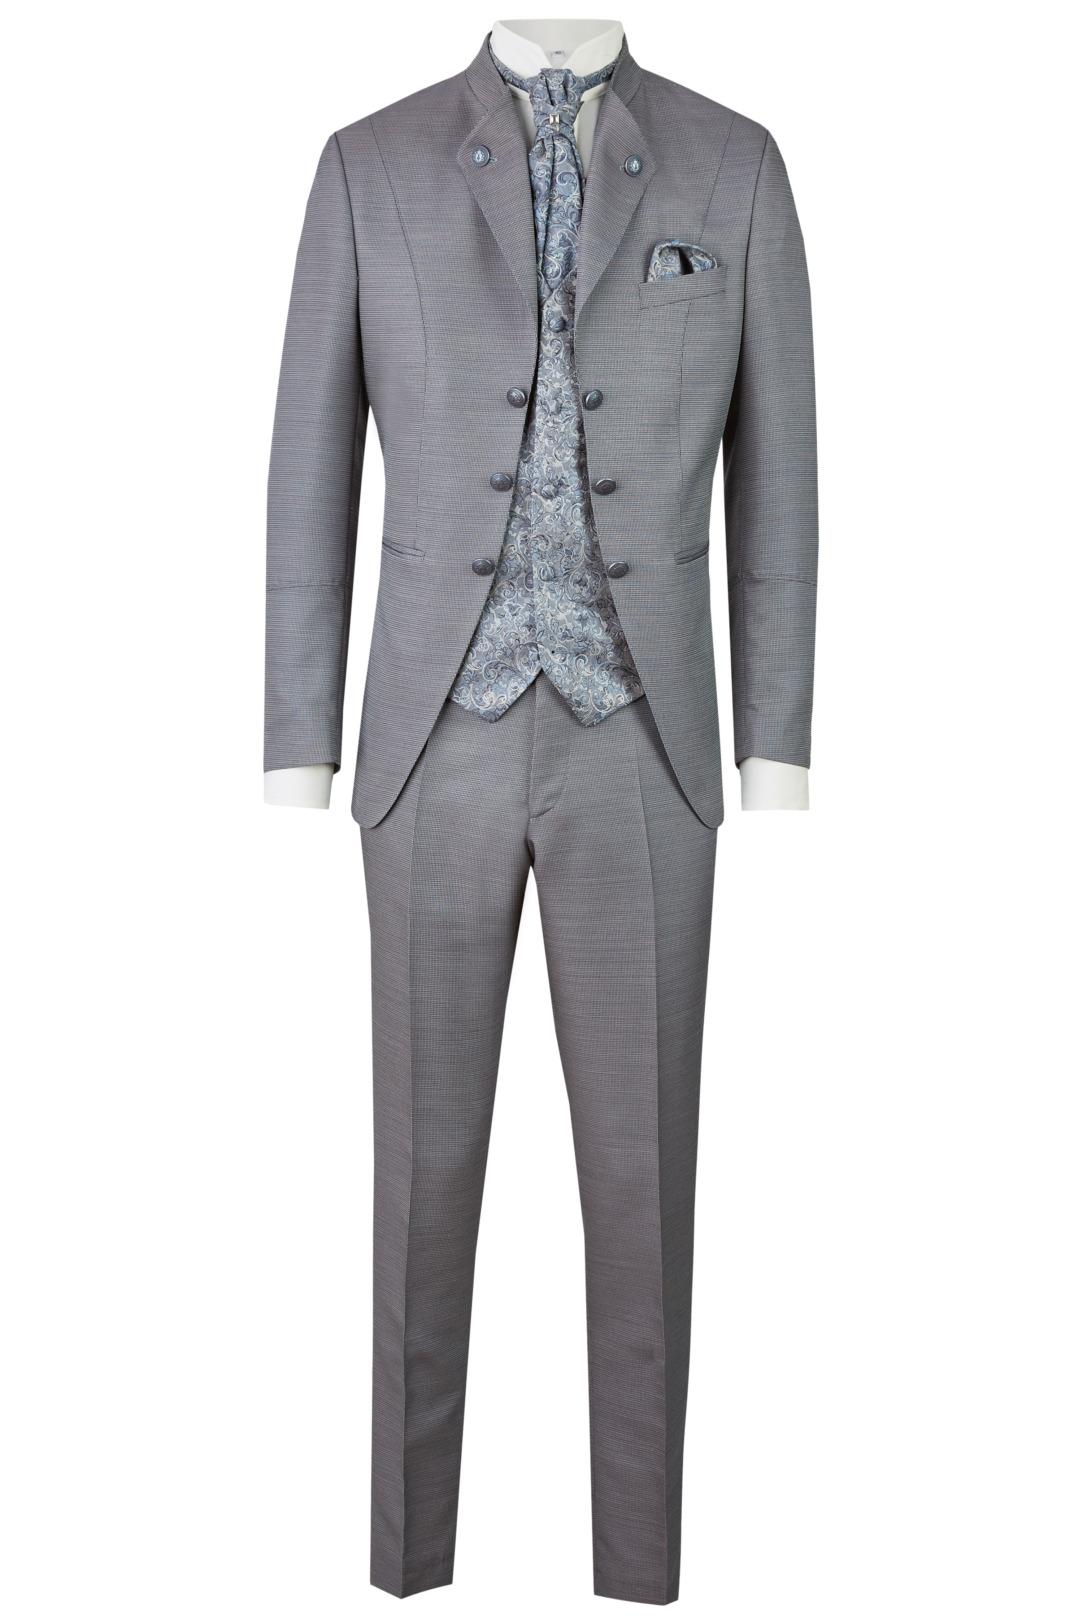 Wilvorst Tziacco Hochzeitsanzug Männer Mode Bräutigam extravagant hellgrau hellblau wil_0121_otf_tz-look-8_1